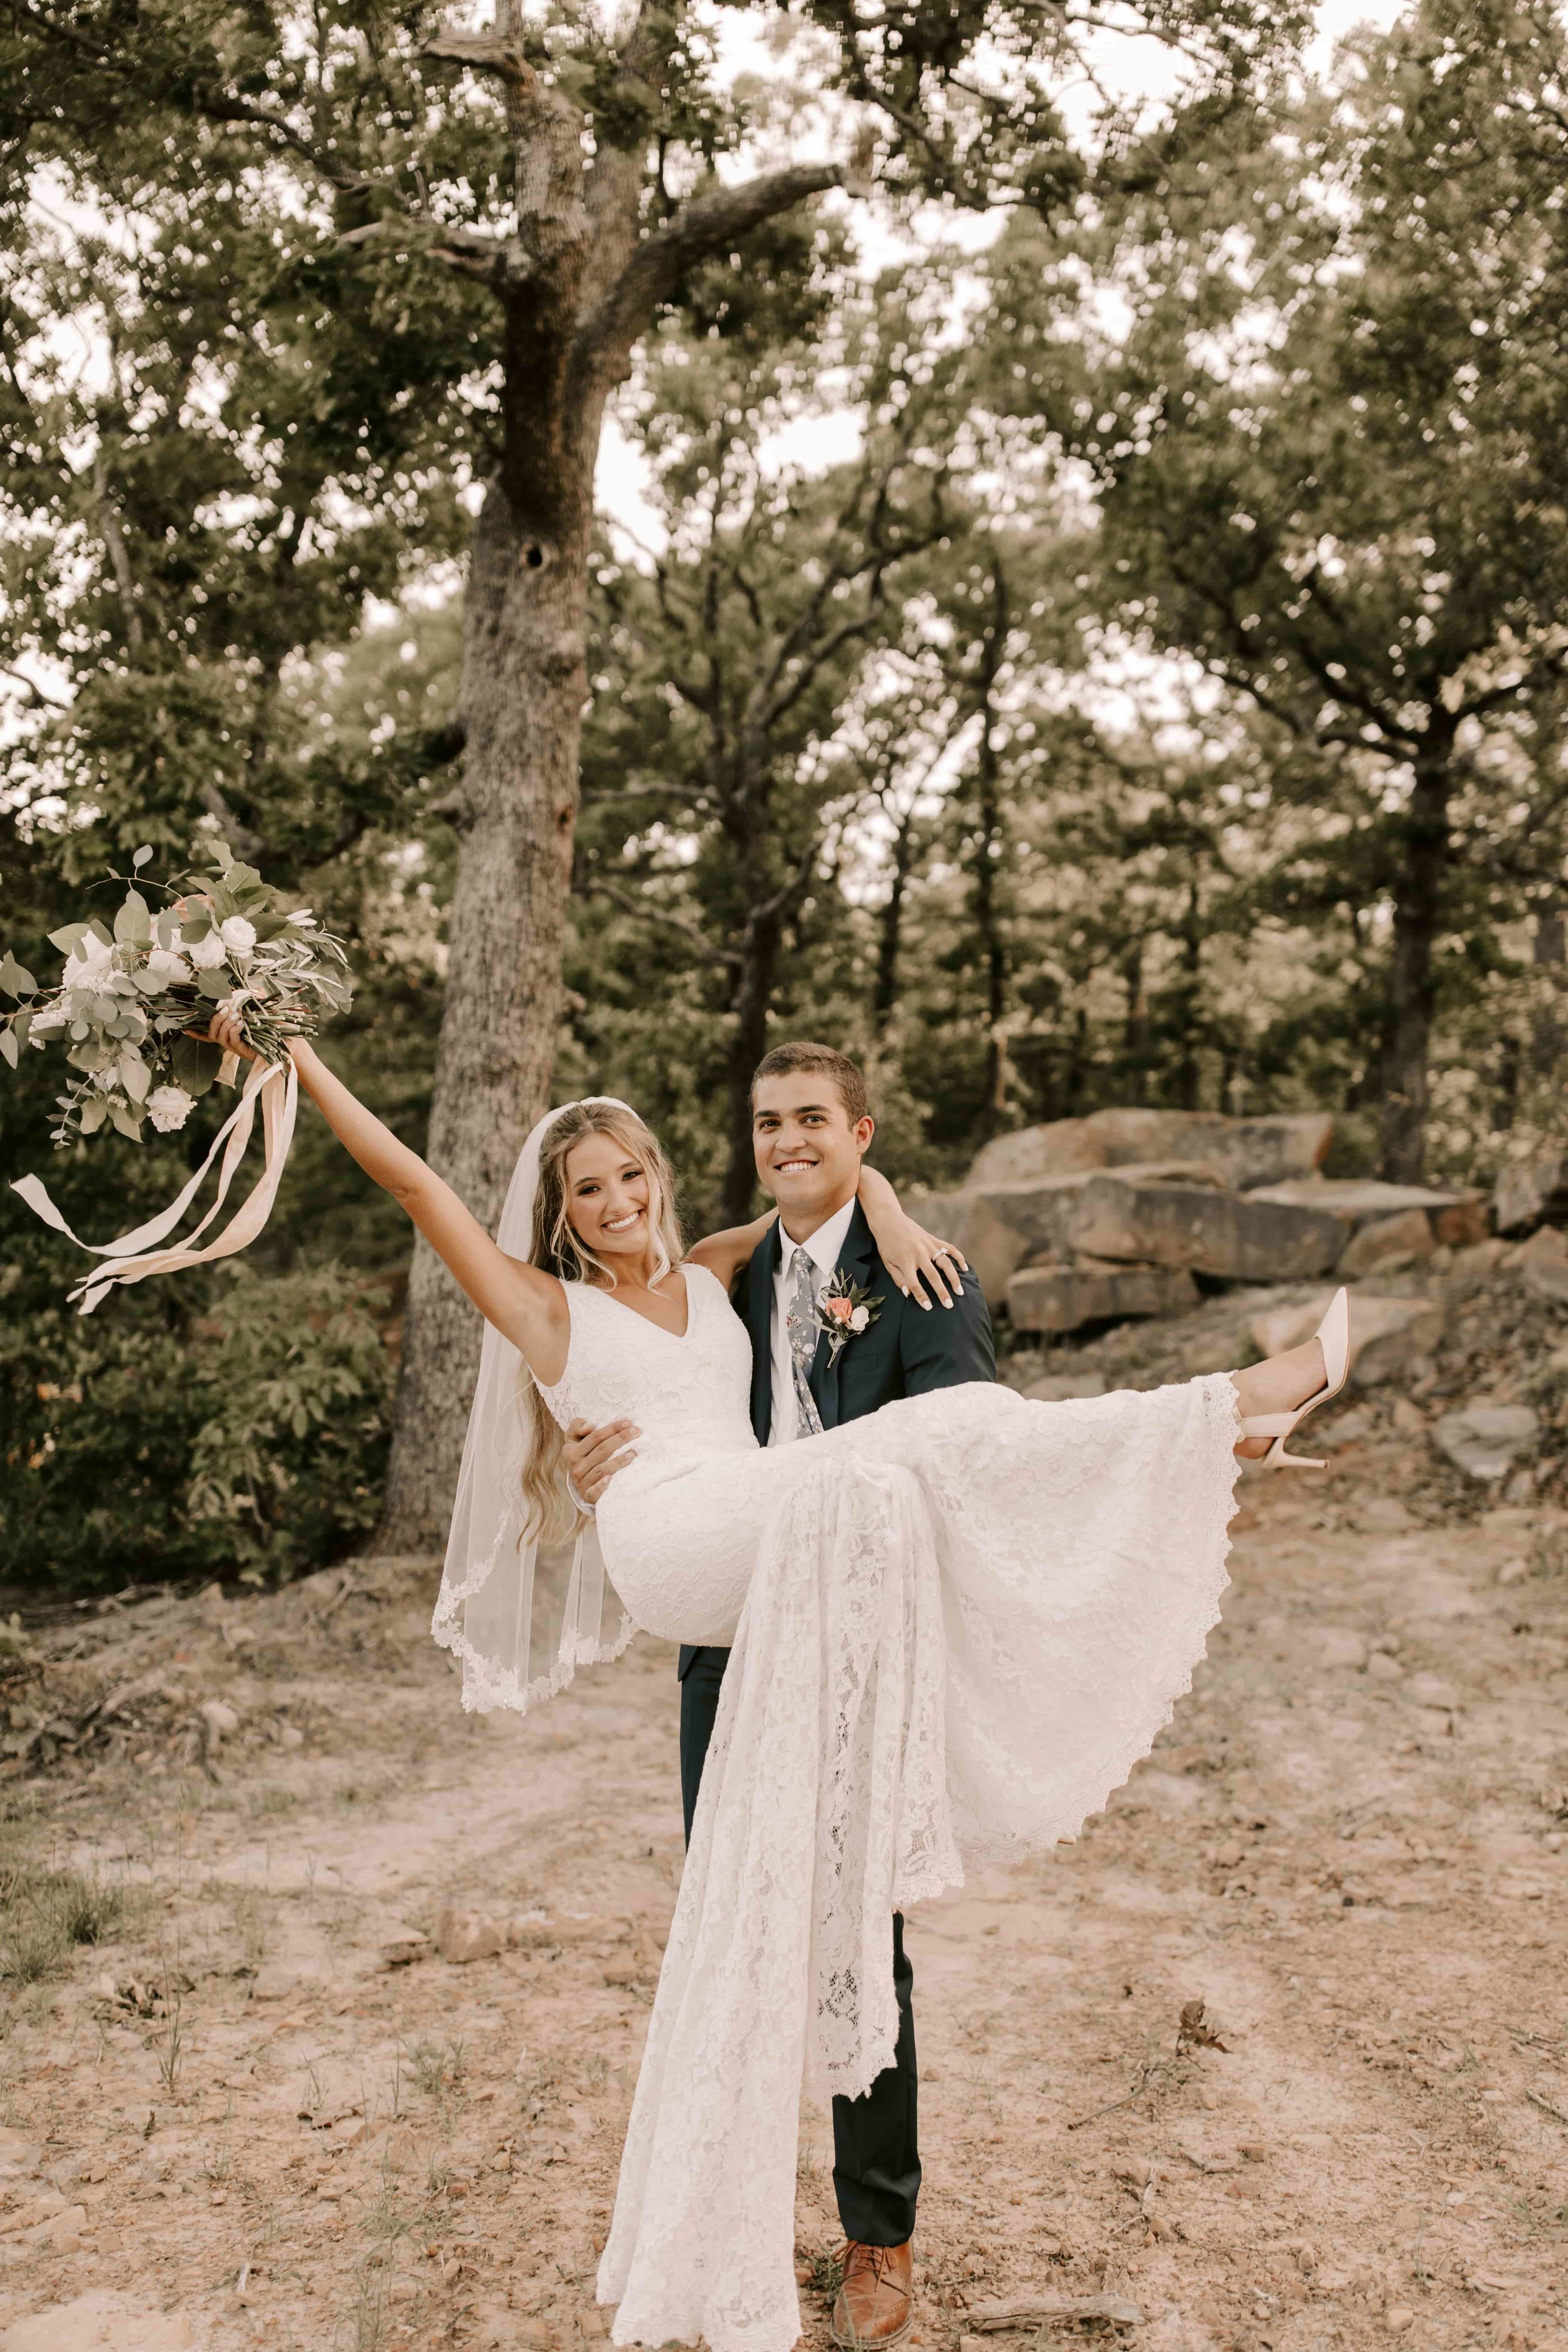 just married tulsa bixby wedding venue 2-min.jpg